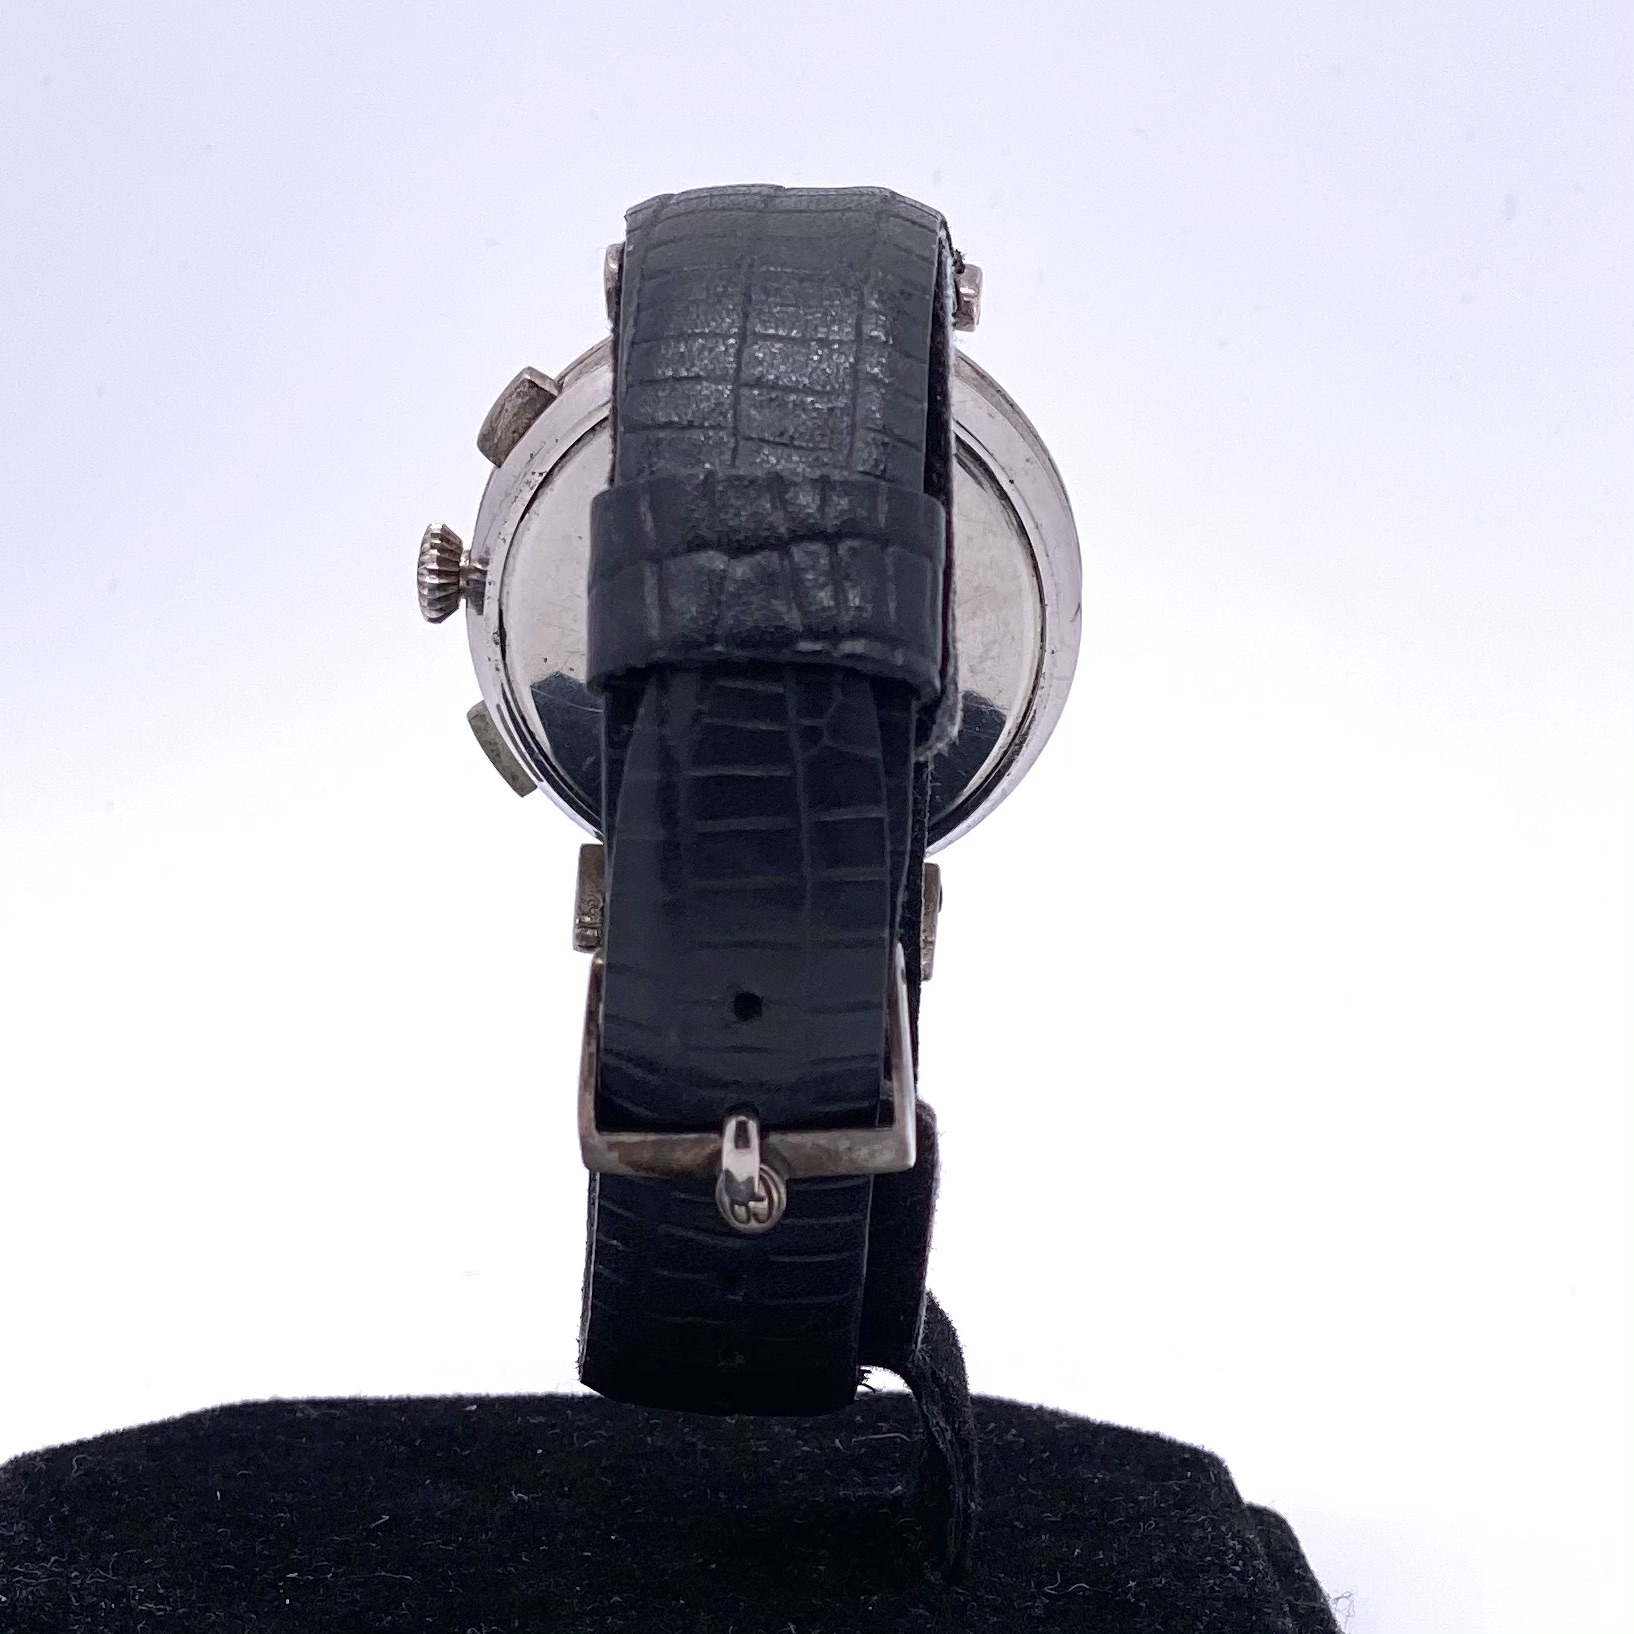 Girard Perregaux Vintage Chronograph - Image 3 of 4